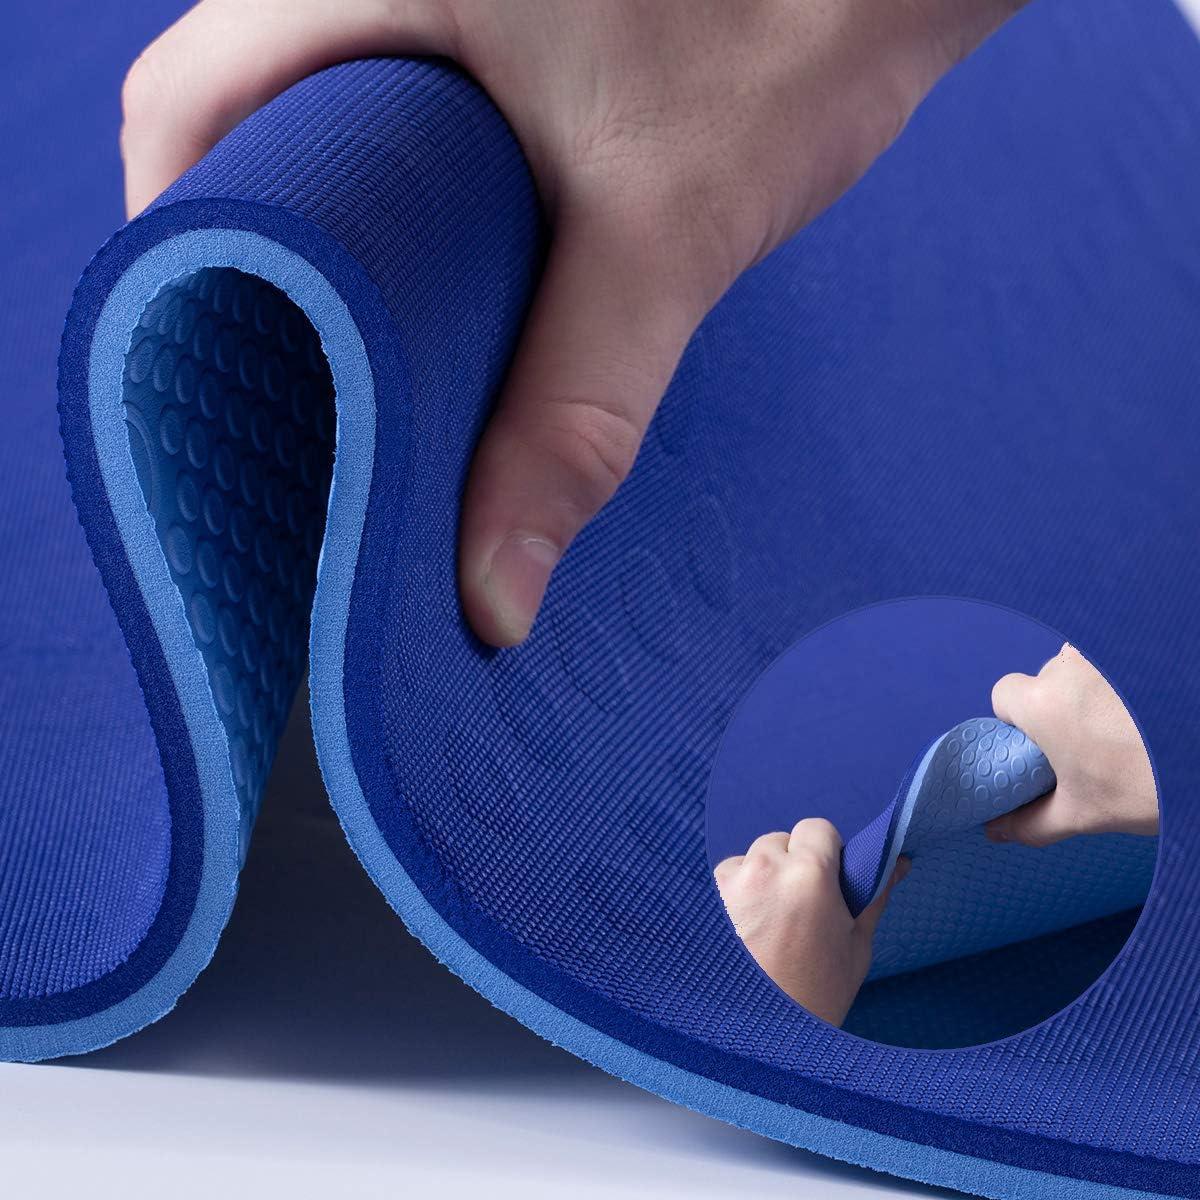 JELS Extra Thick Yoga Mat 2 5 Desig inch Quality inspection Non service 3D Slip Ergonomic